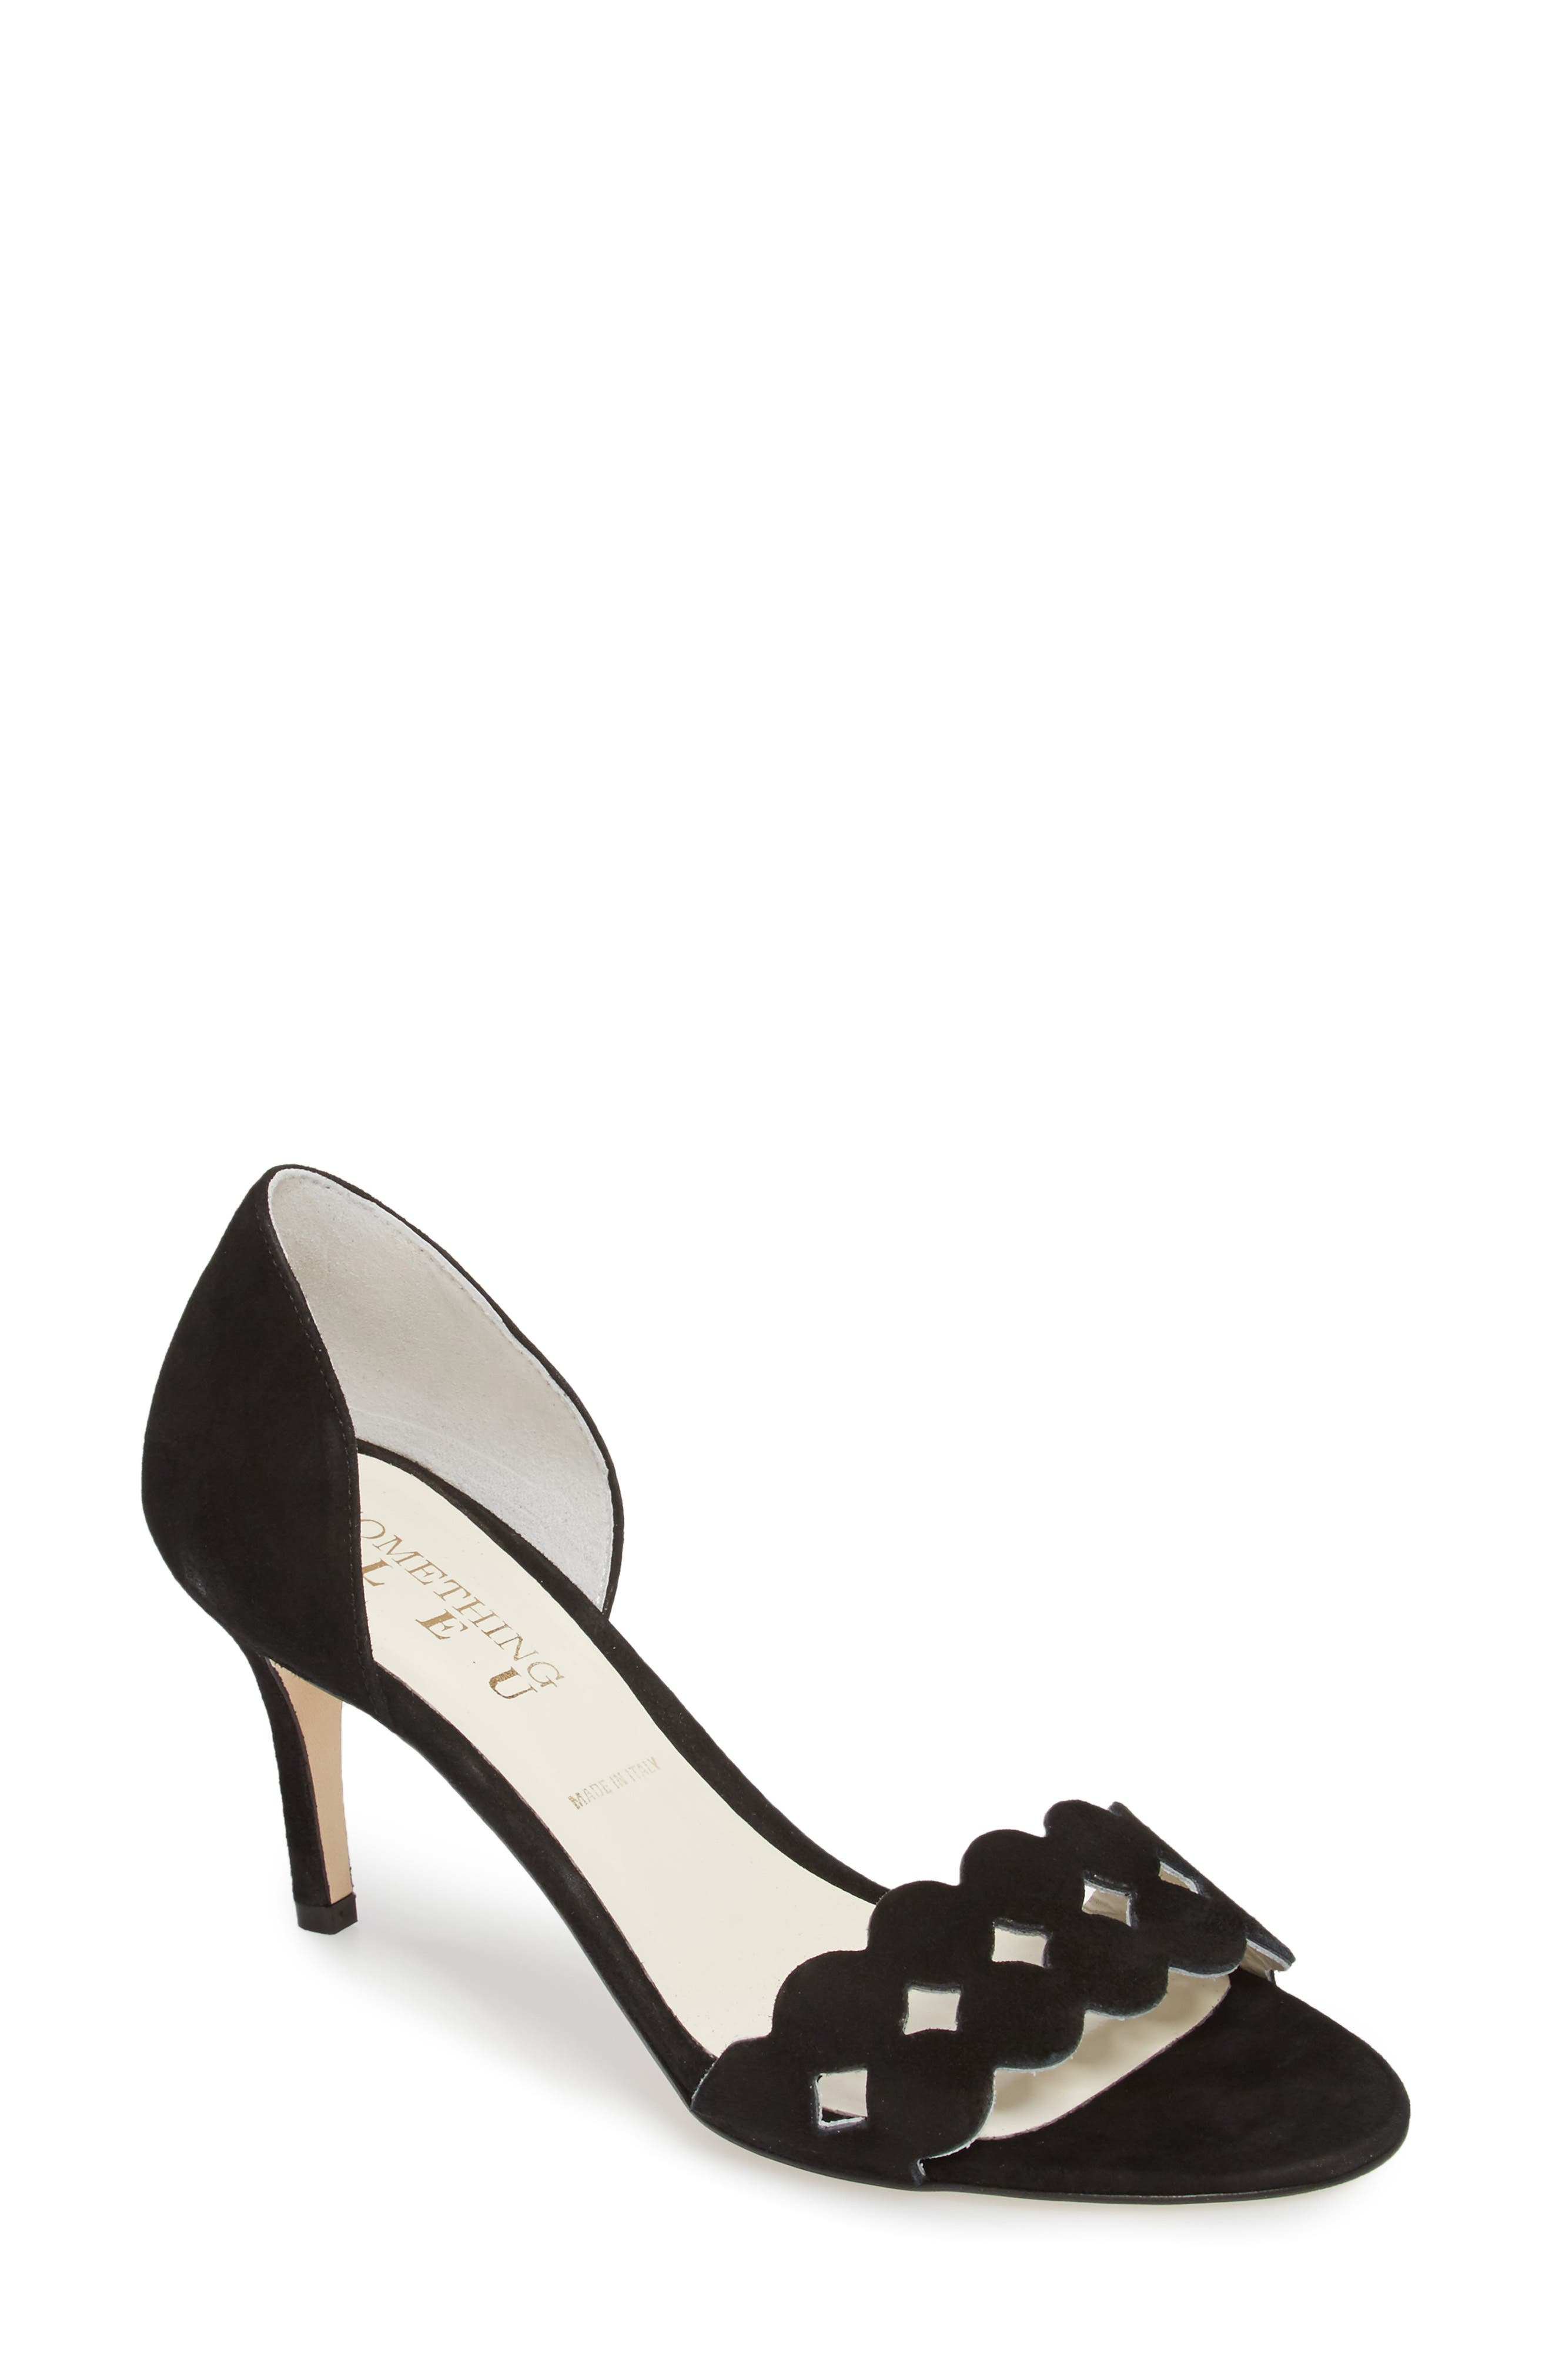 Alternate Image 1 Selected - Something Bleu Catherine Cutout Sandal (Women)